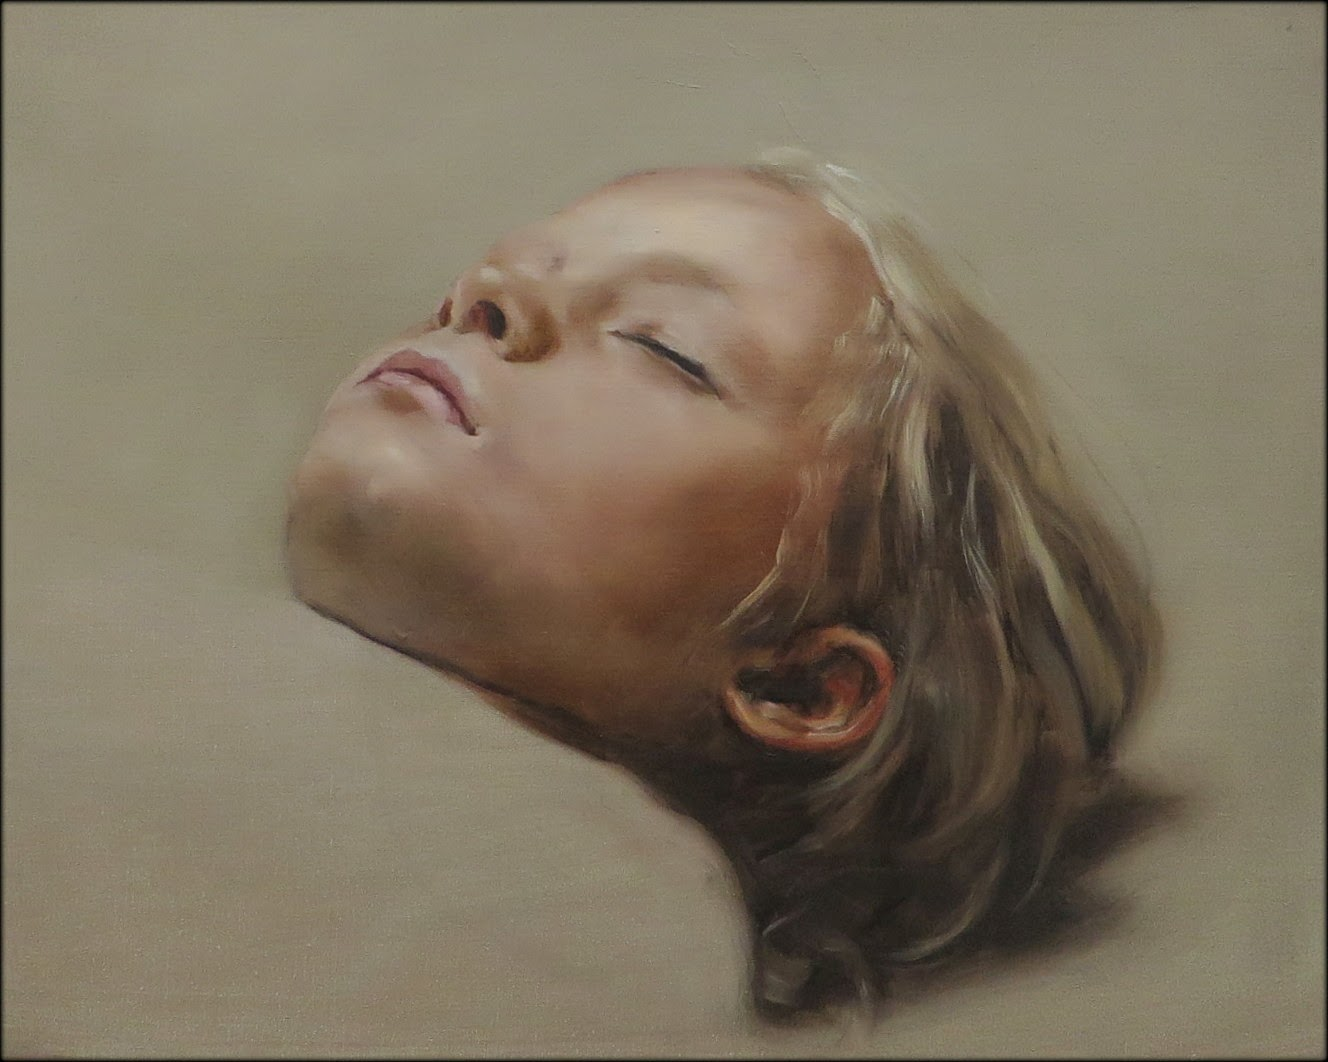 Michael Borremans - the sleeper